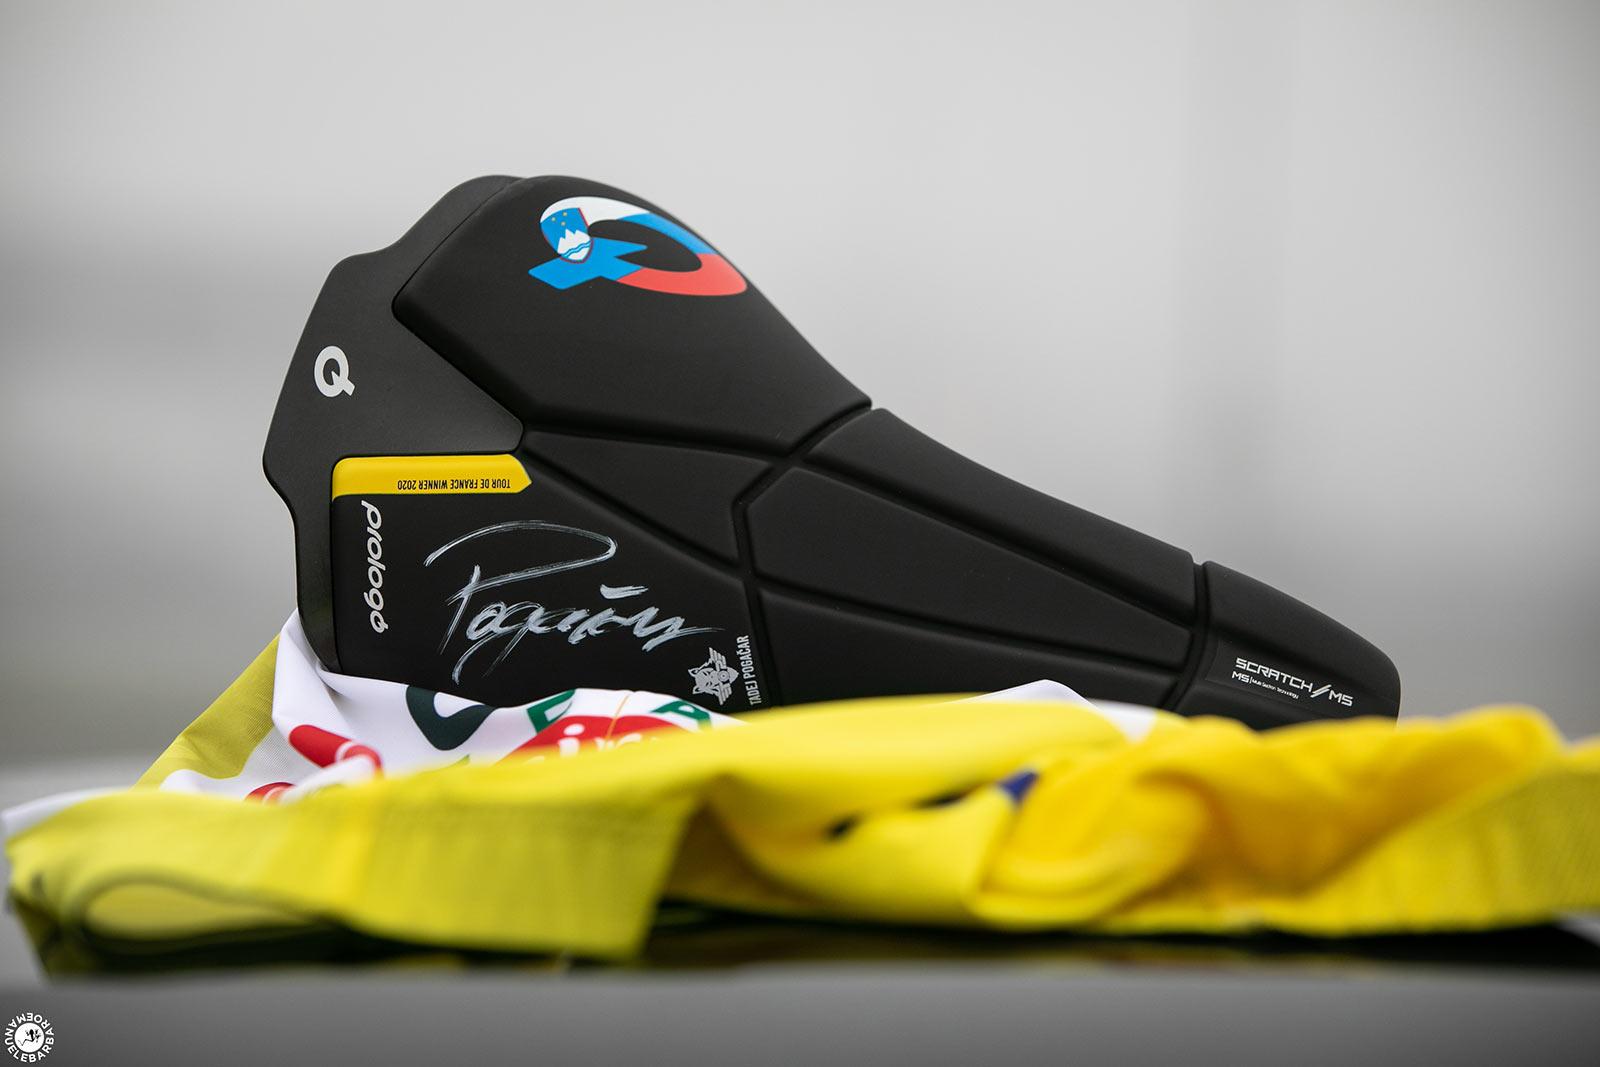 limited edition prologo scratch m5 road bike saddle signed by tour de france winner tadej pogacar